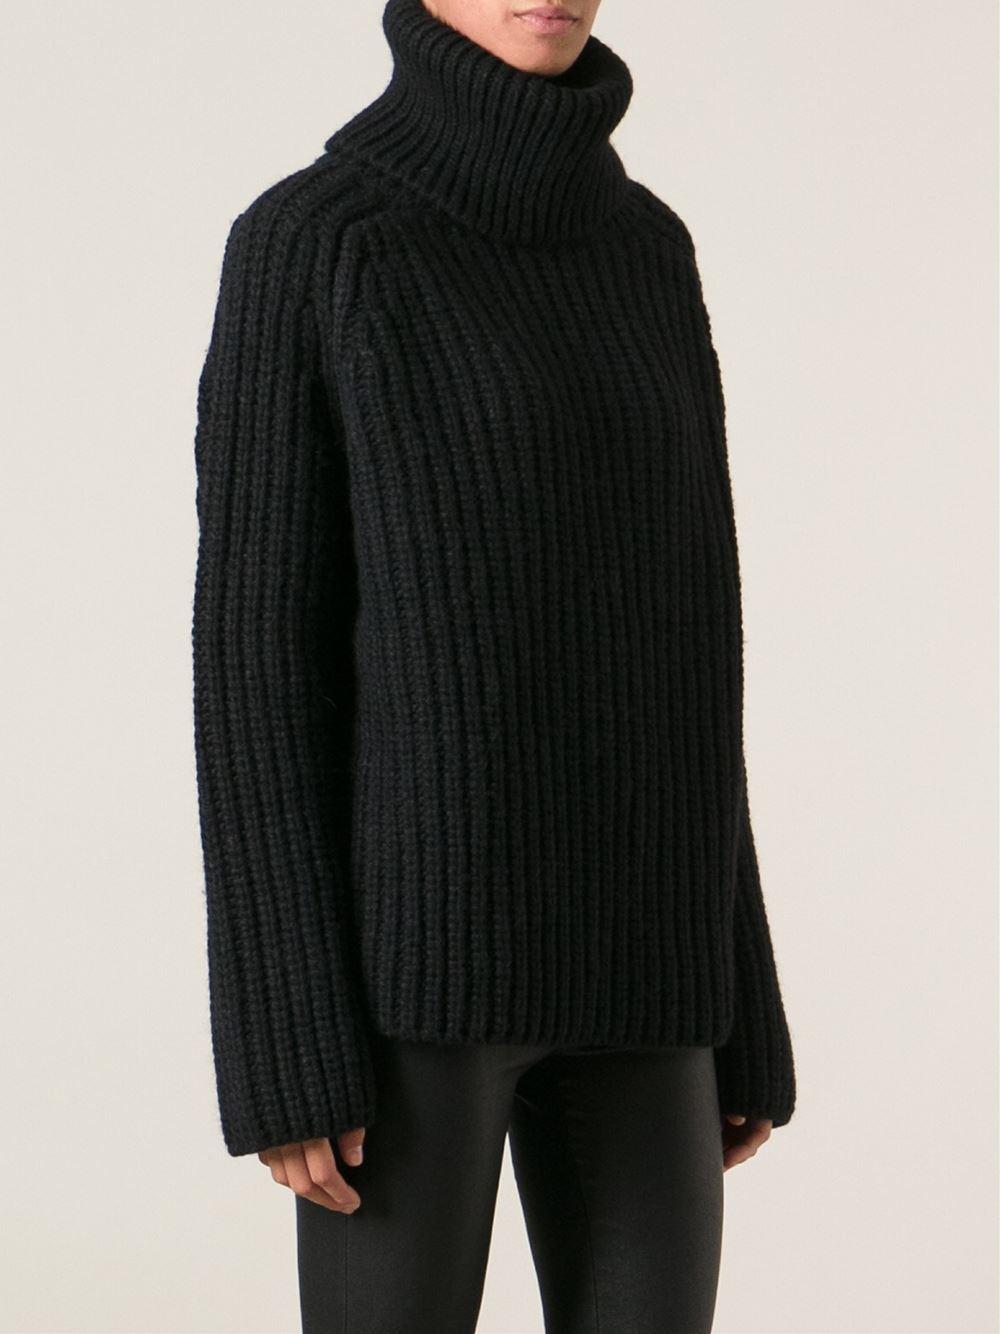 Ann demeulemeester Chunky Knit Turtleneck Sweater in Black | Lyst